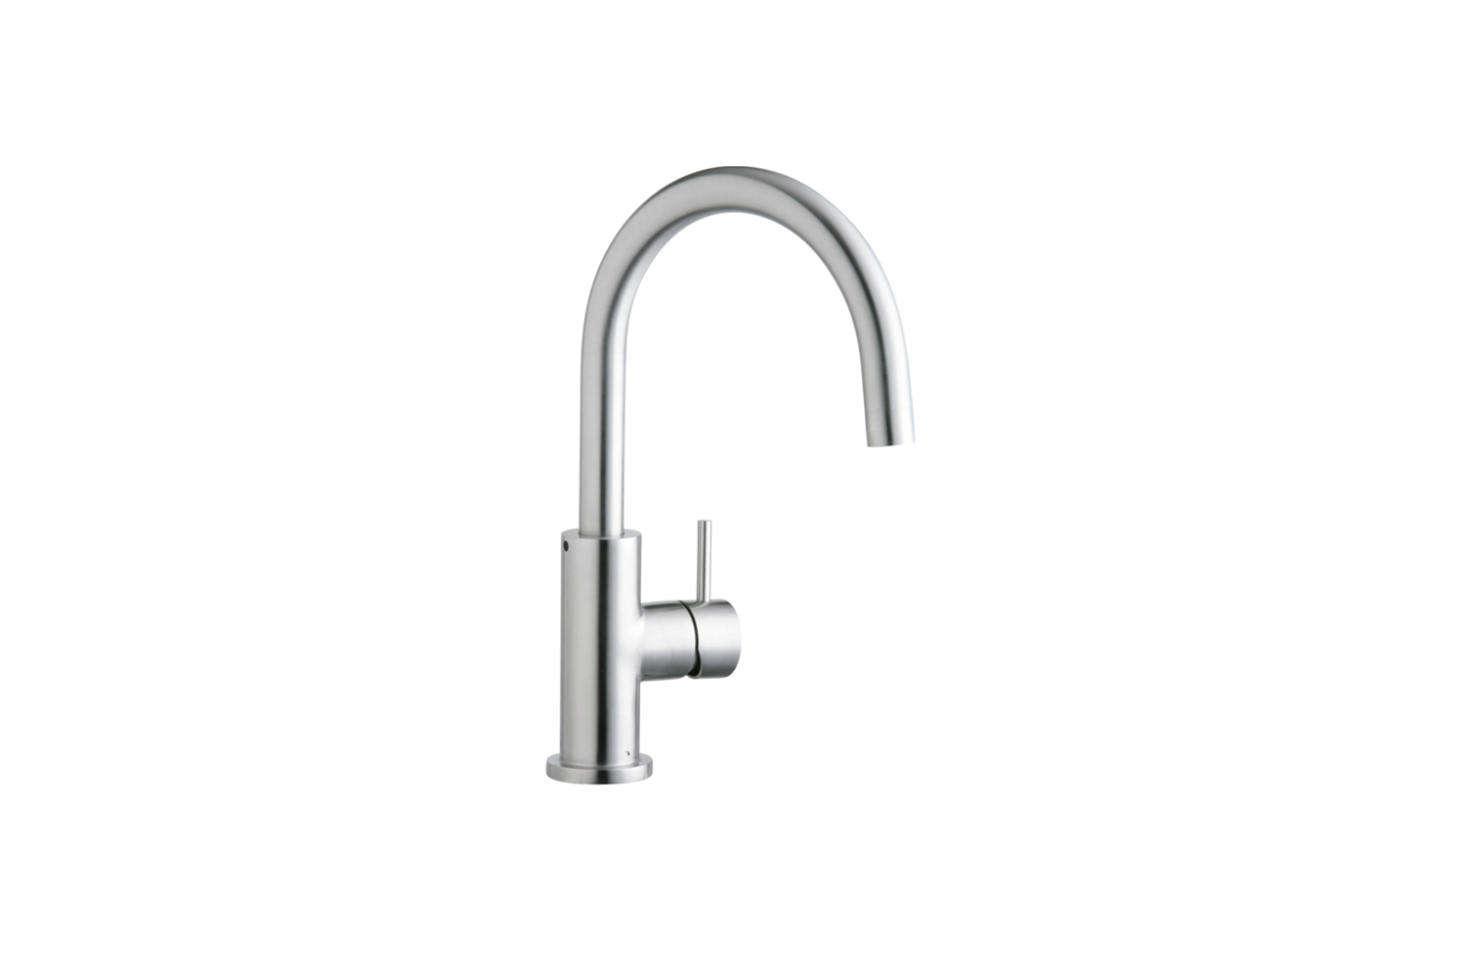 Best Kitchen Faucet | Beer Tap Lock for